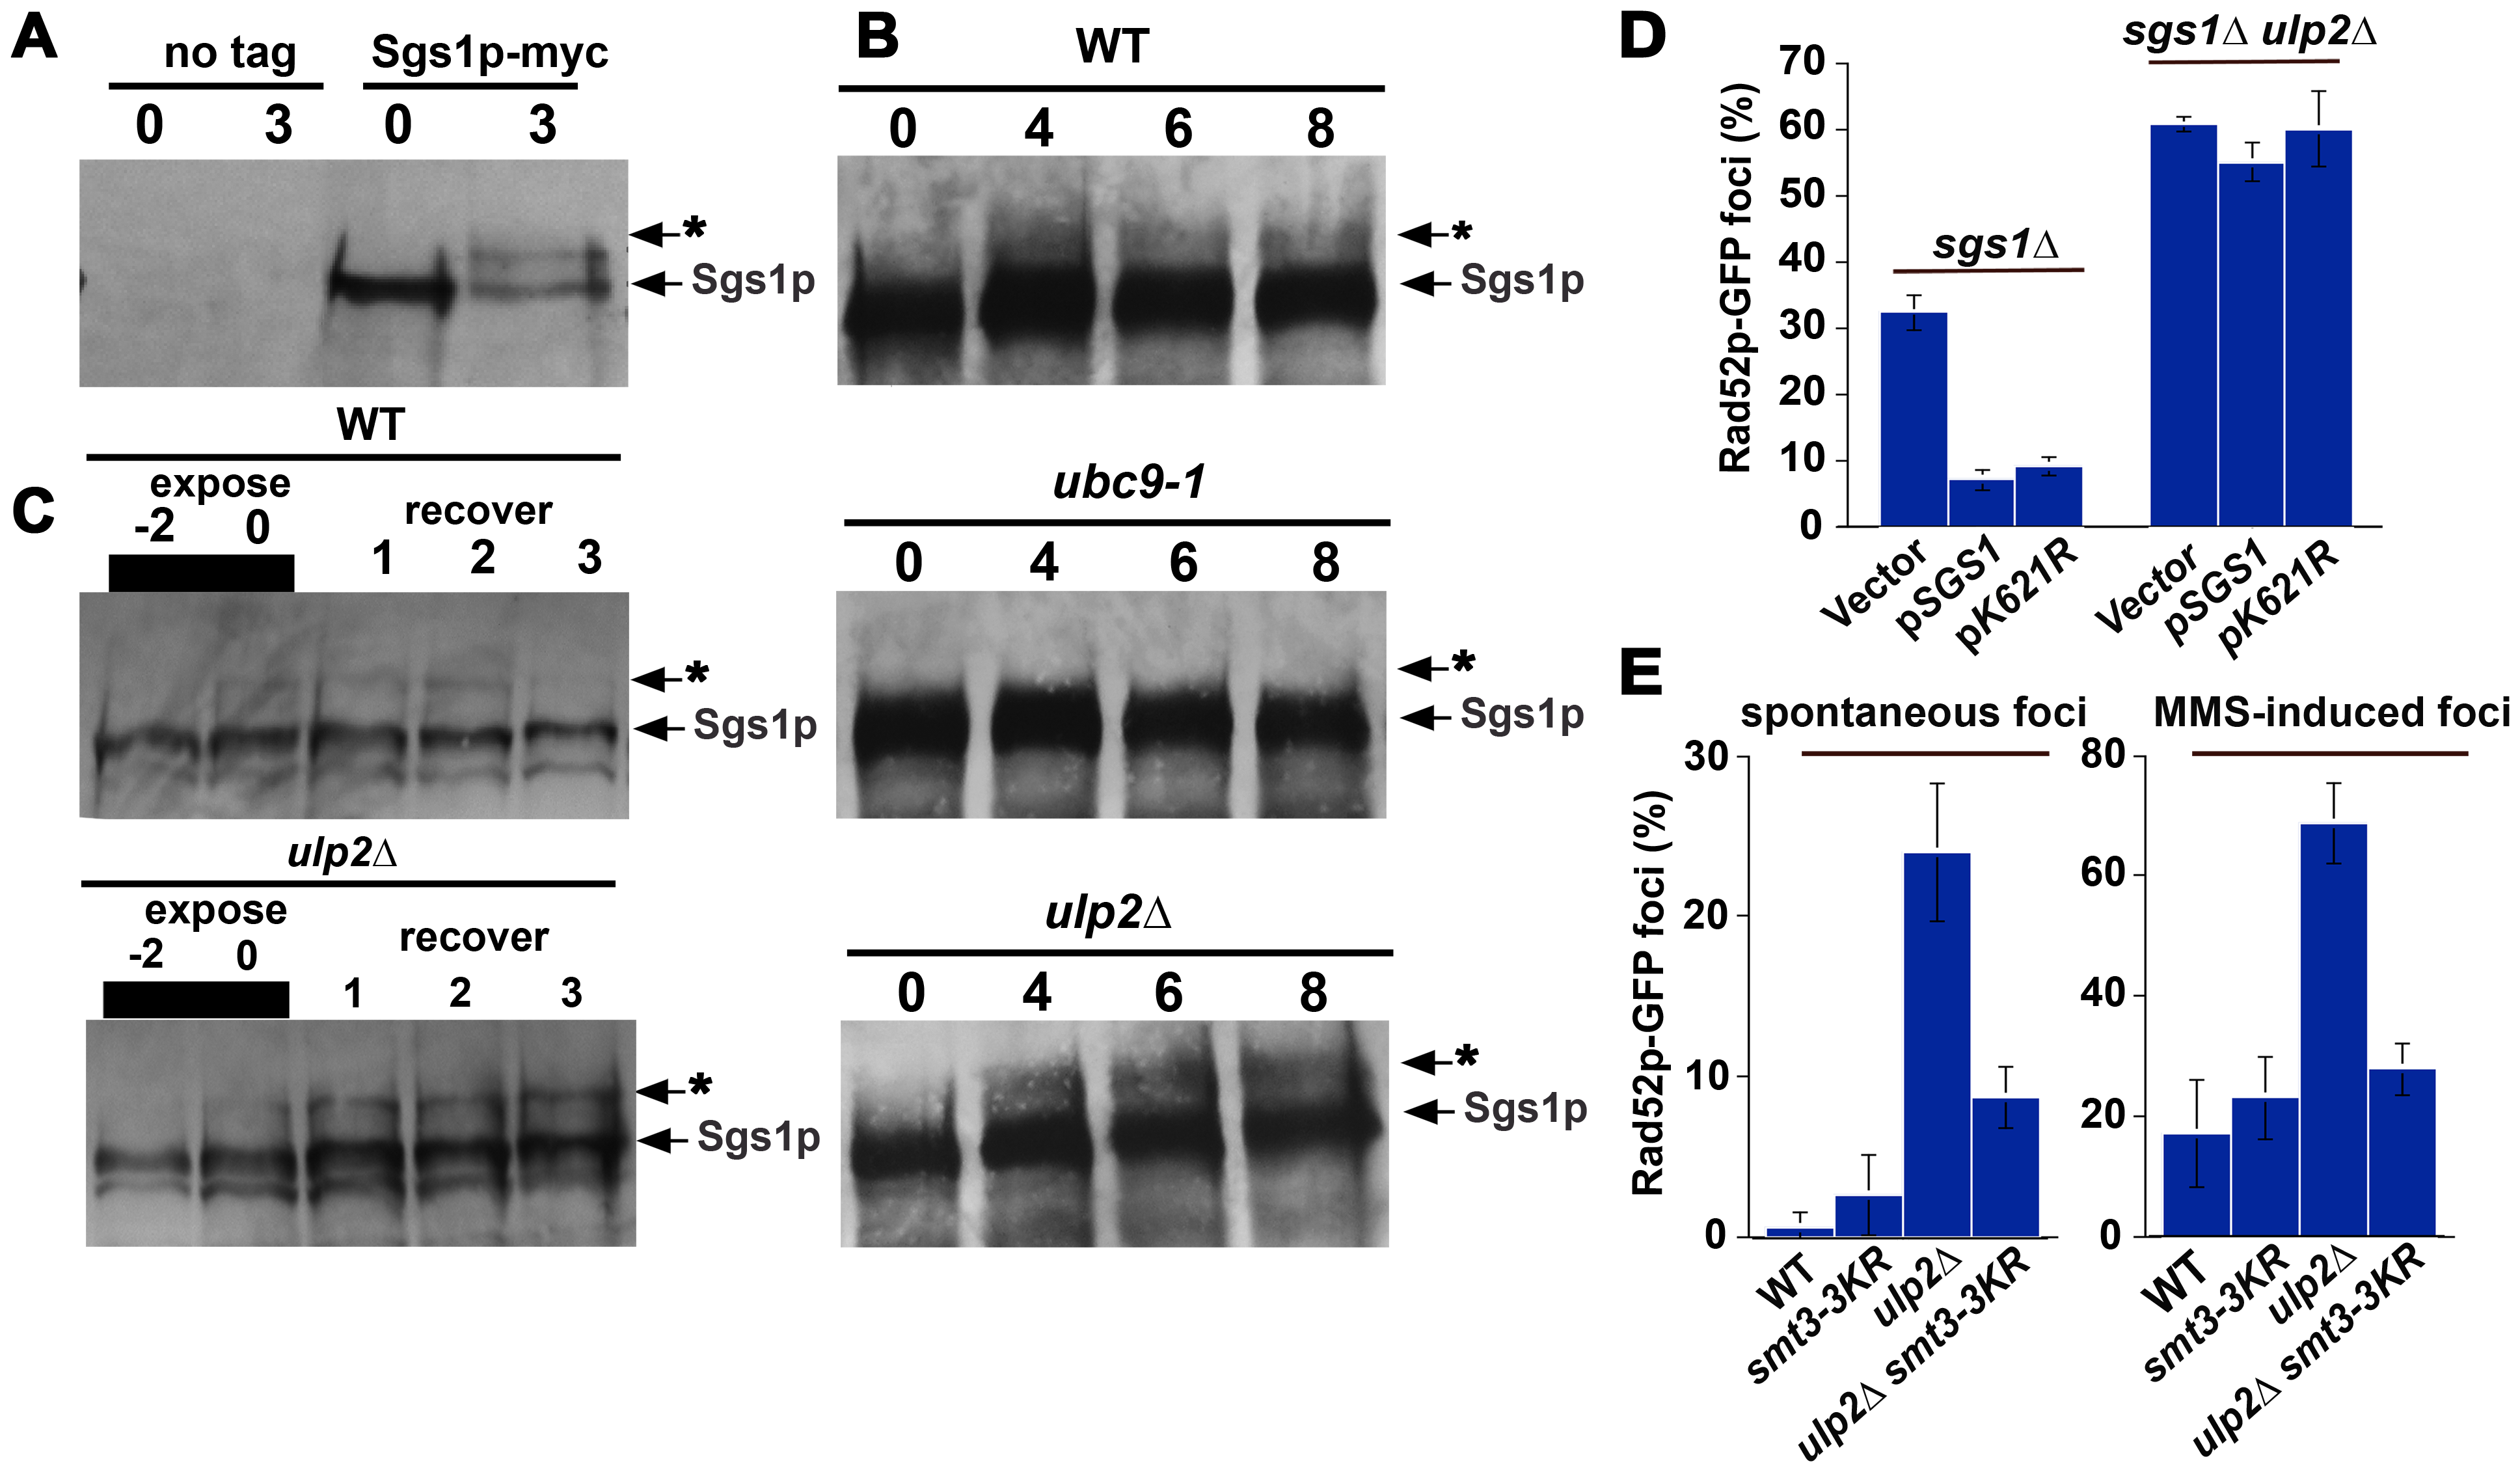 Sgs1p sumoylation in <i>ulp2</i>Δ <b>mutants.</b>